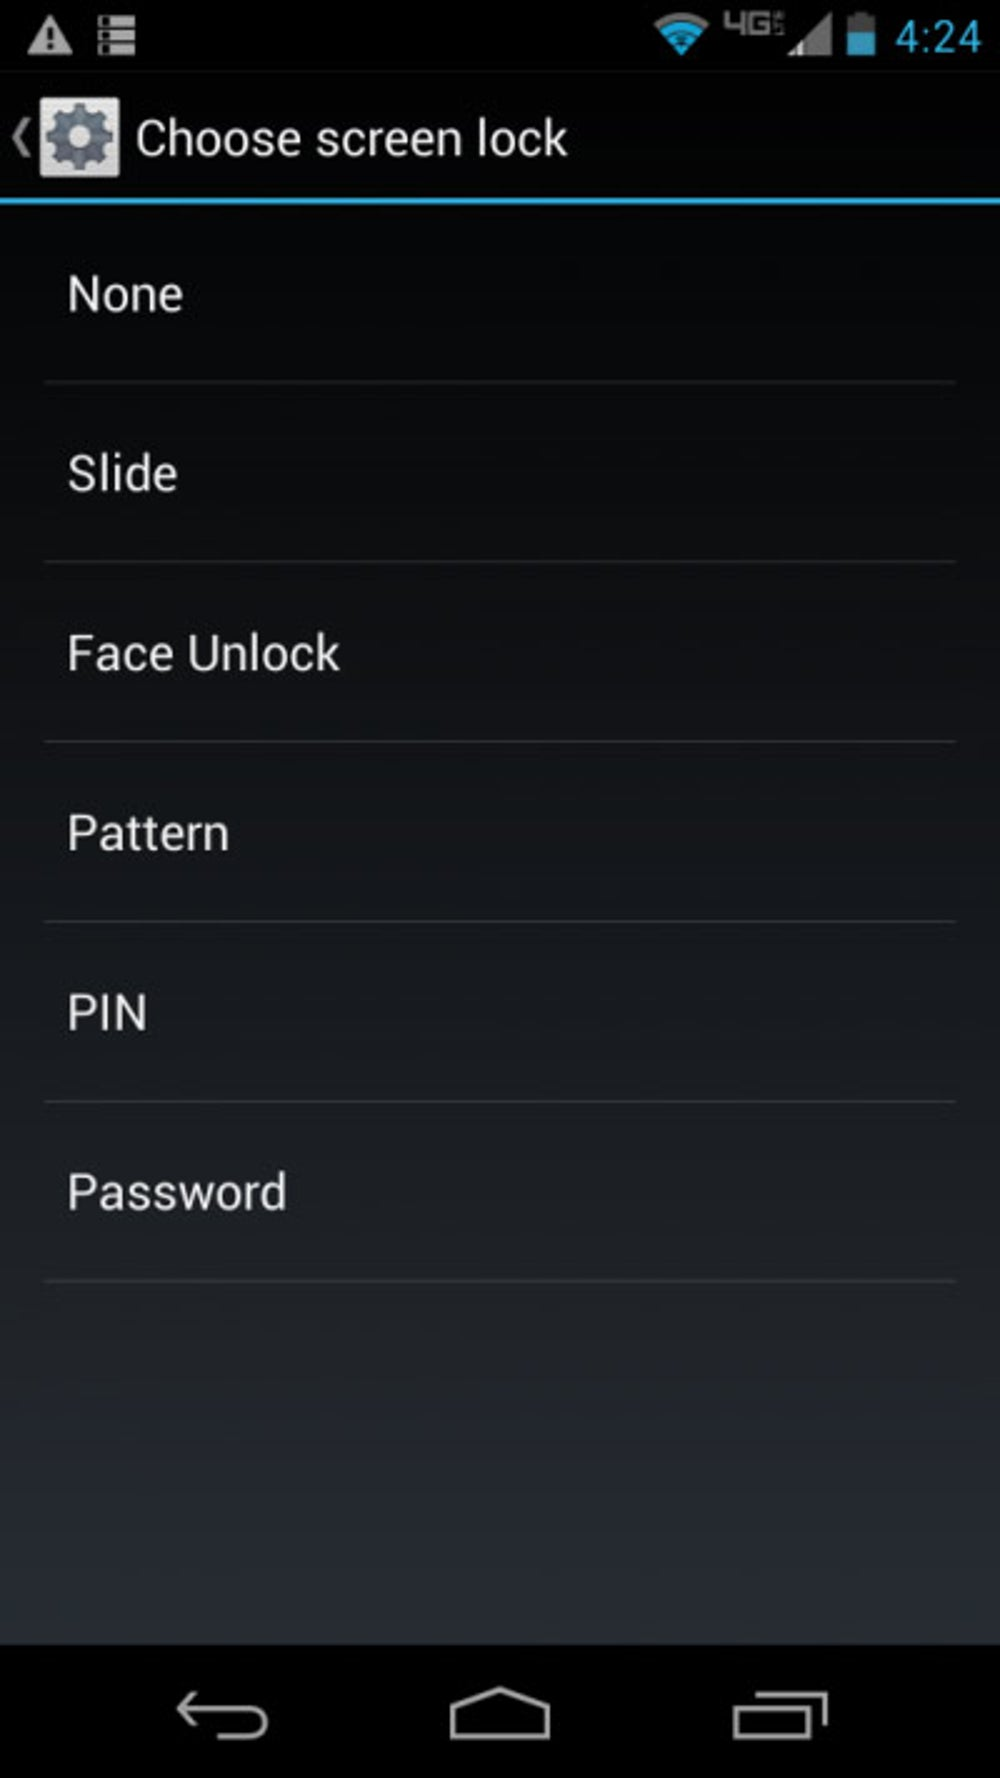 Phone Unlock Options